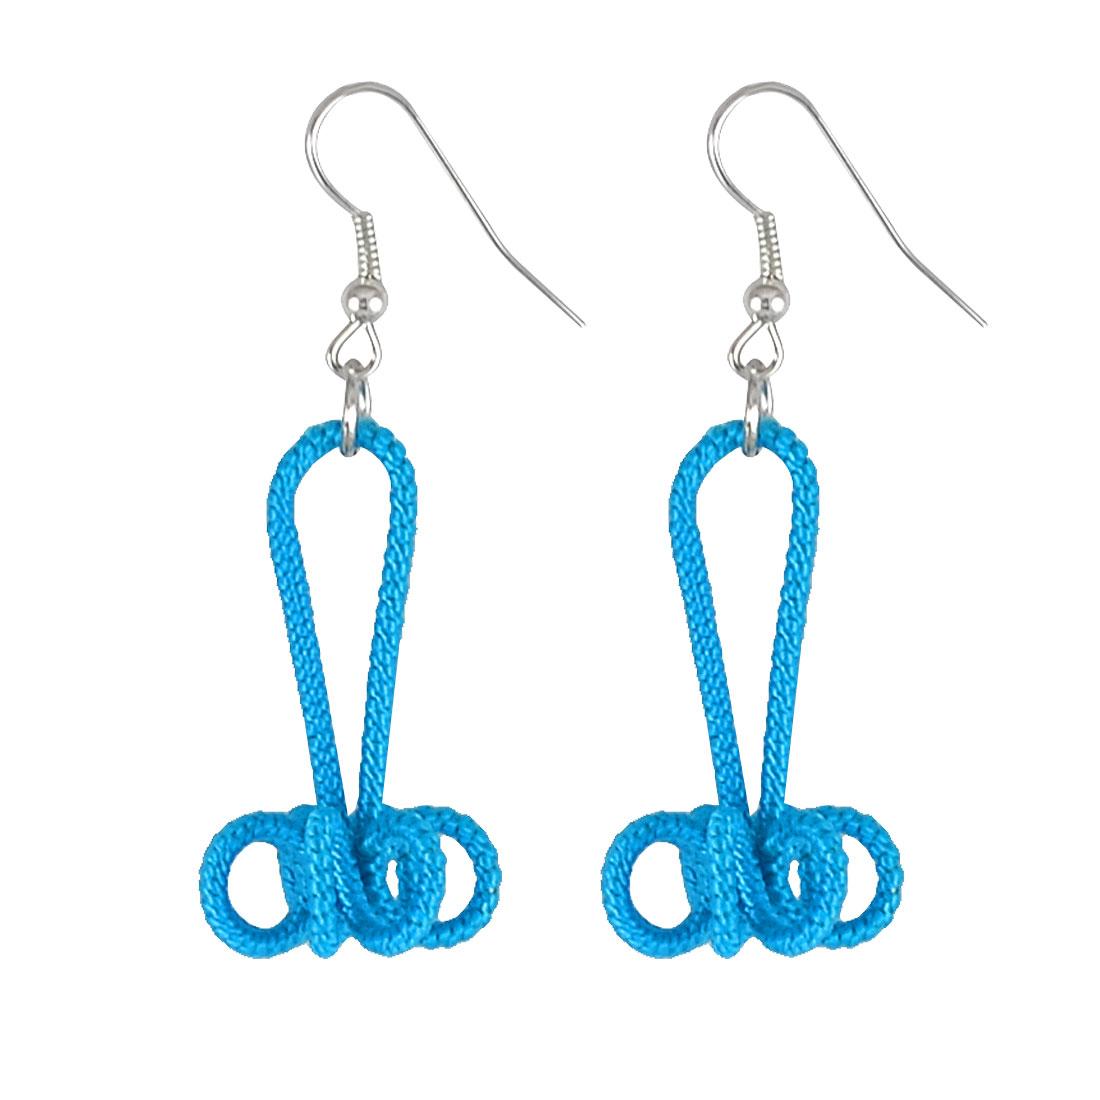 Lady Aqua Blue Handcraft Nylon Cord Coated Floral Flower Dangle Fish Hook Earrings Pair